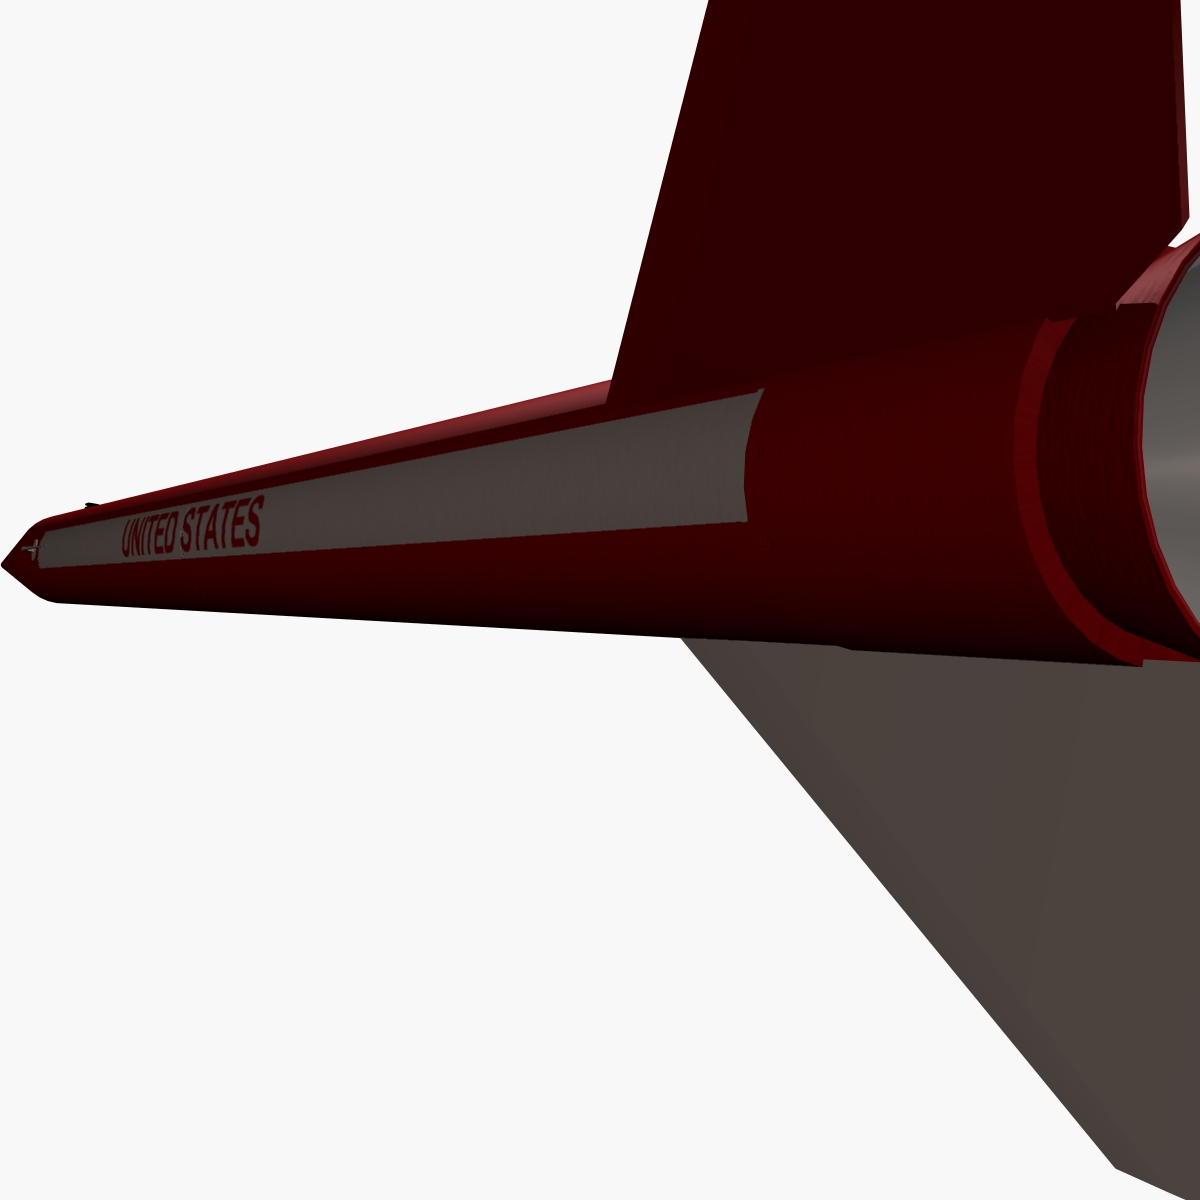 хар хун III пуужин 3d загвар 3ds дууг сонсогдож dxf cob x obj 150820